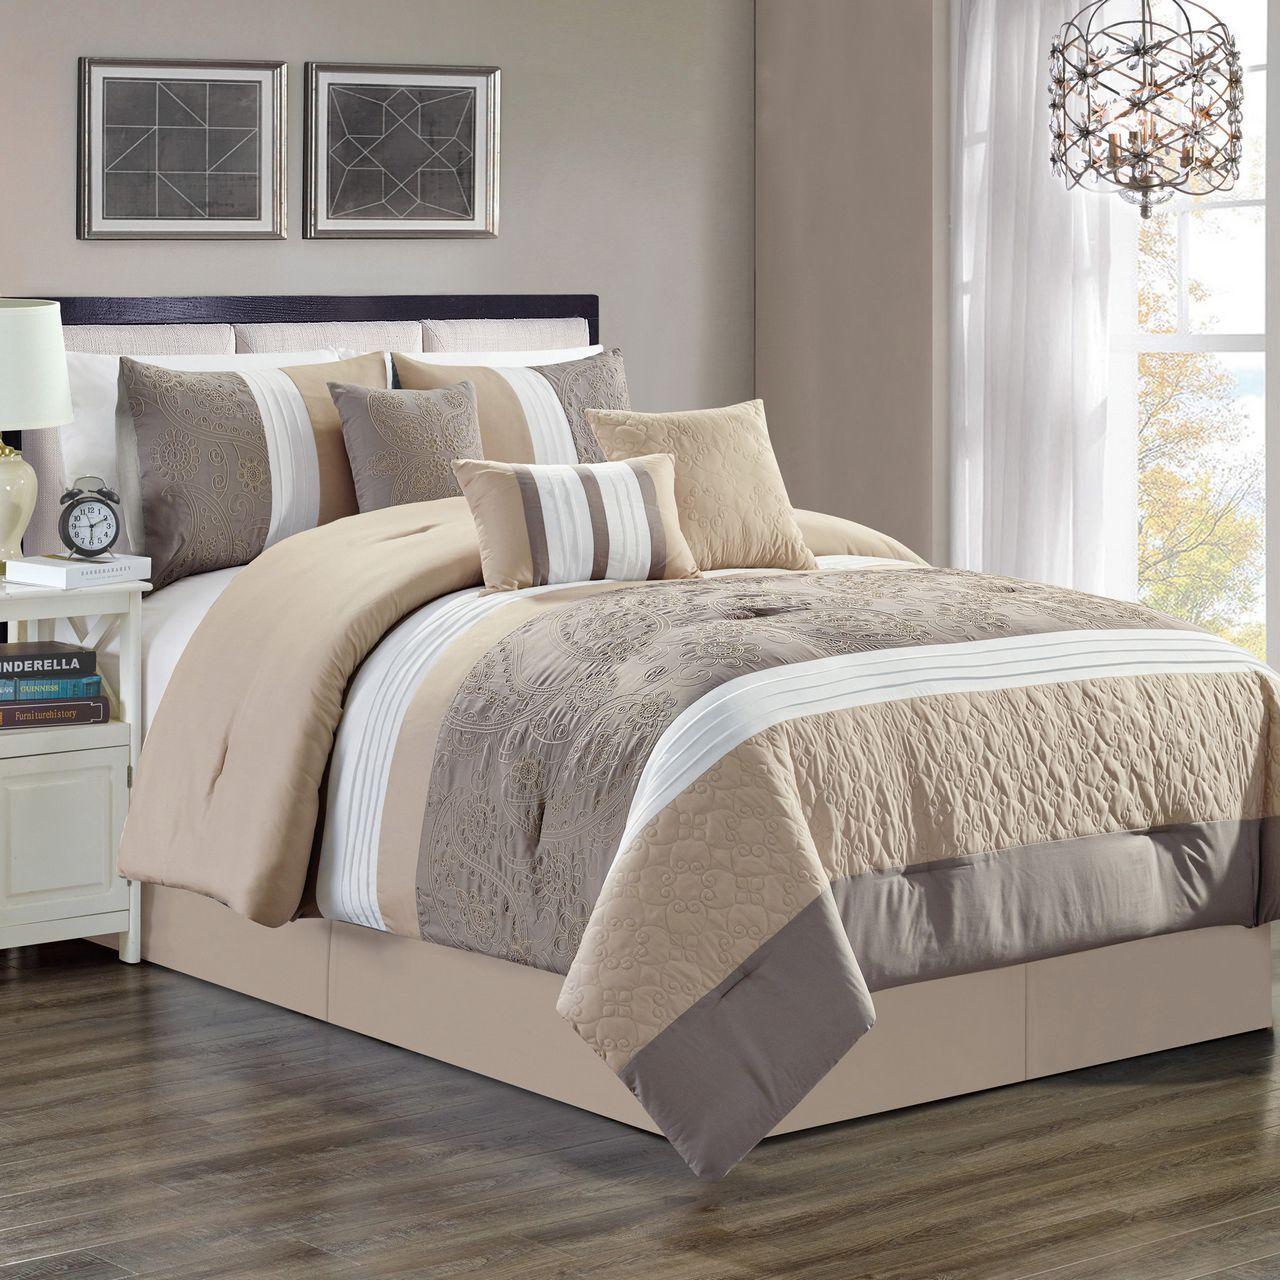 7 Piece Delano Taupe Comforter Set